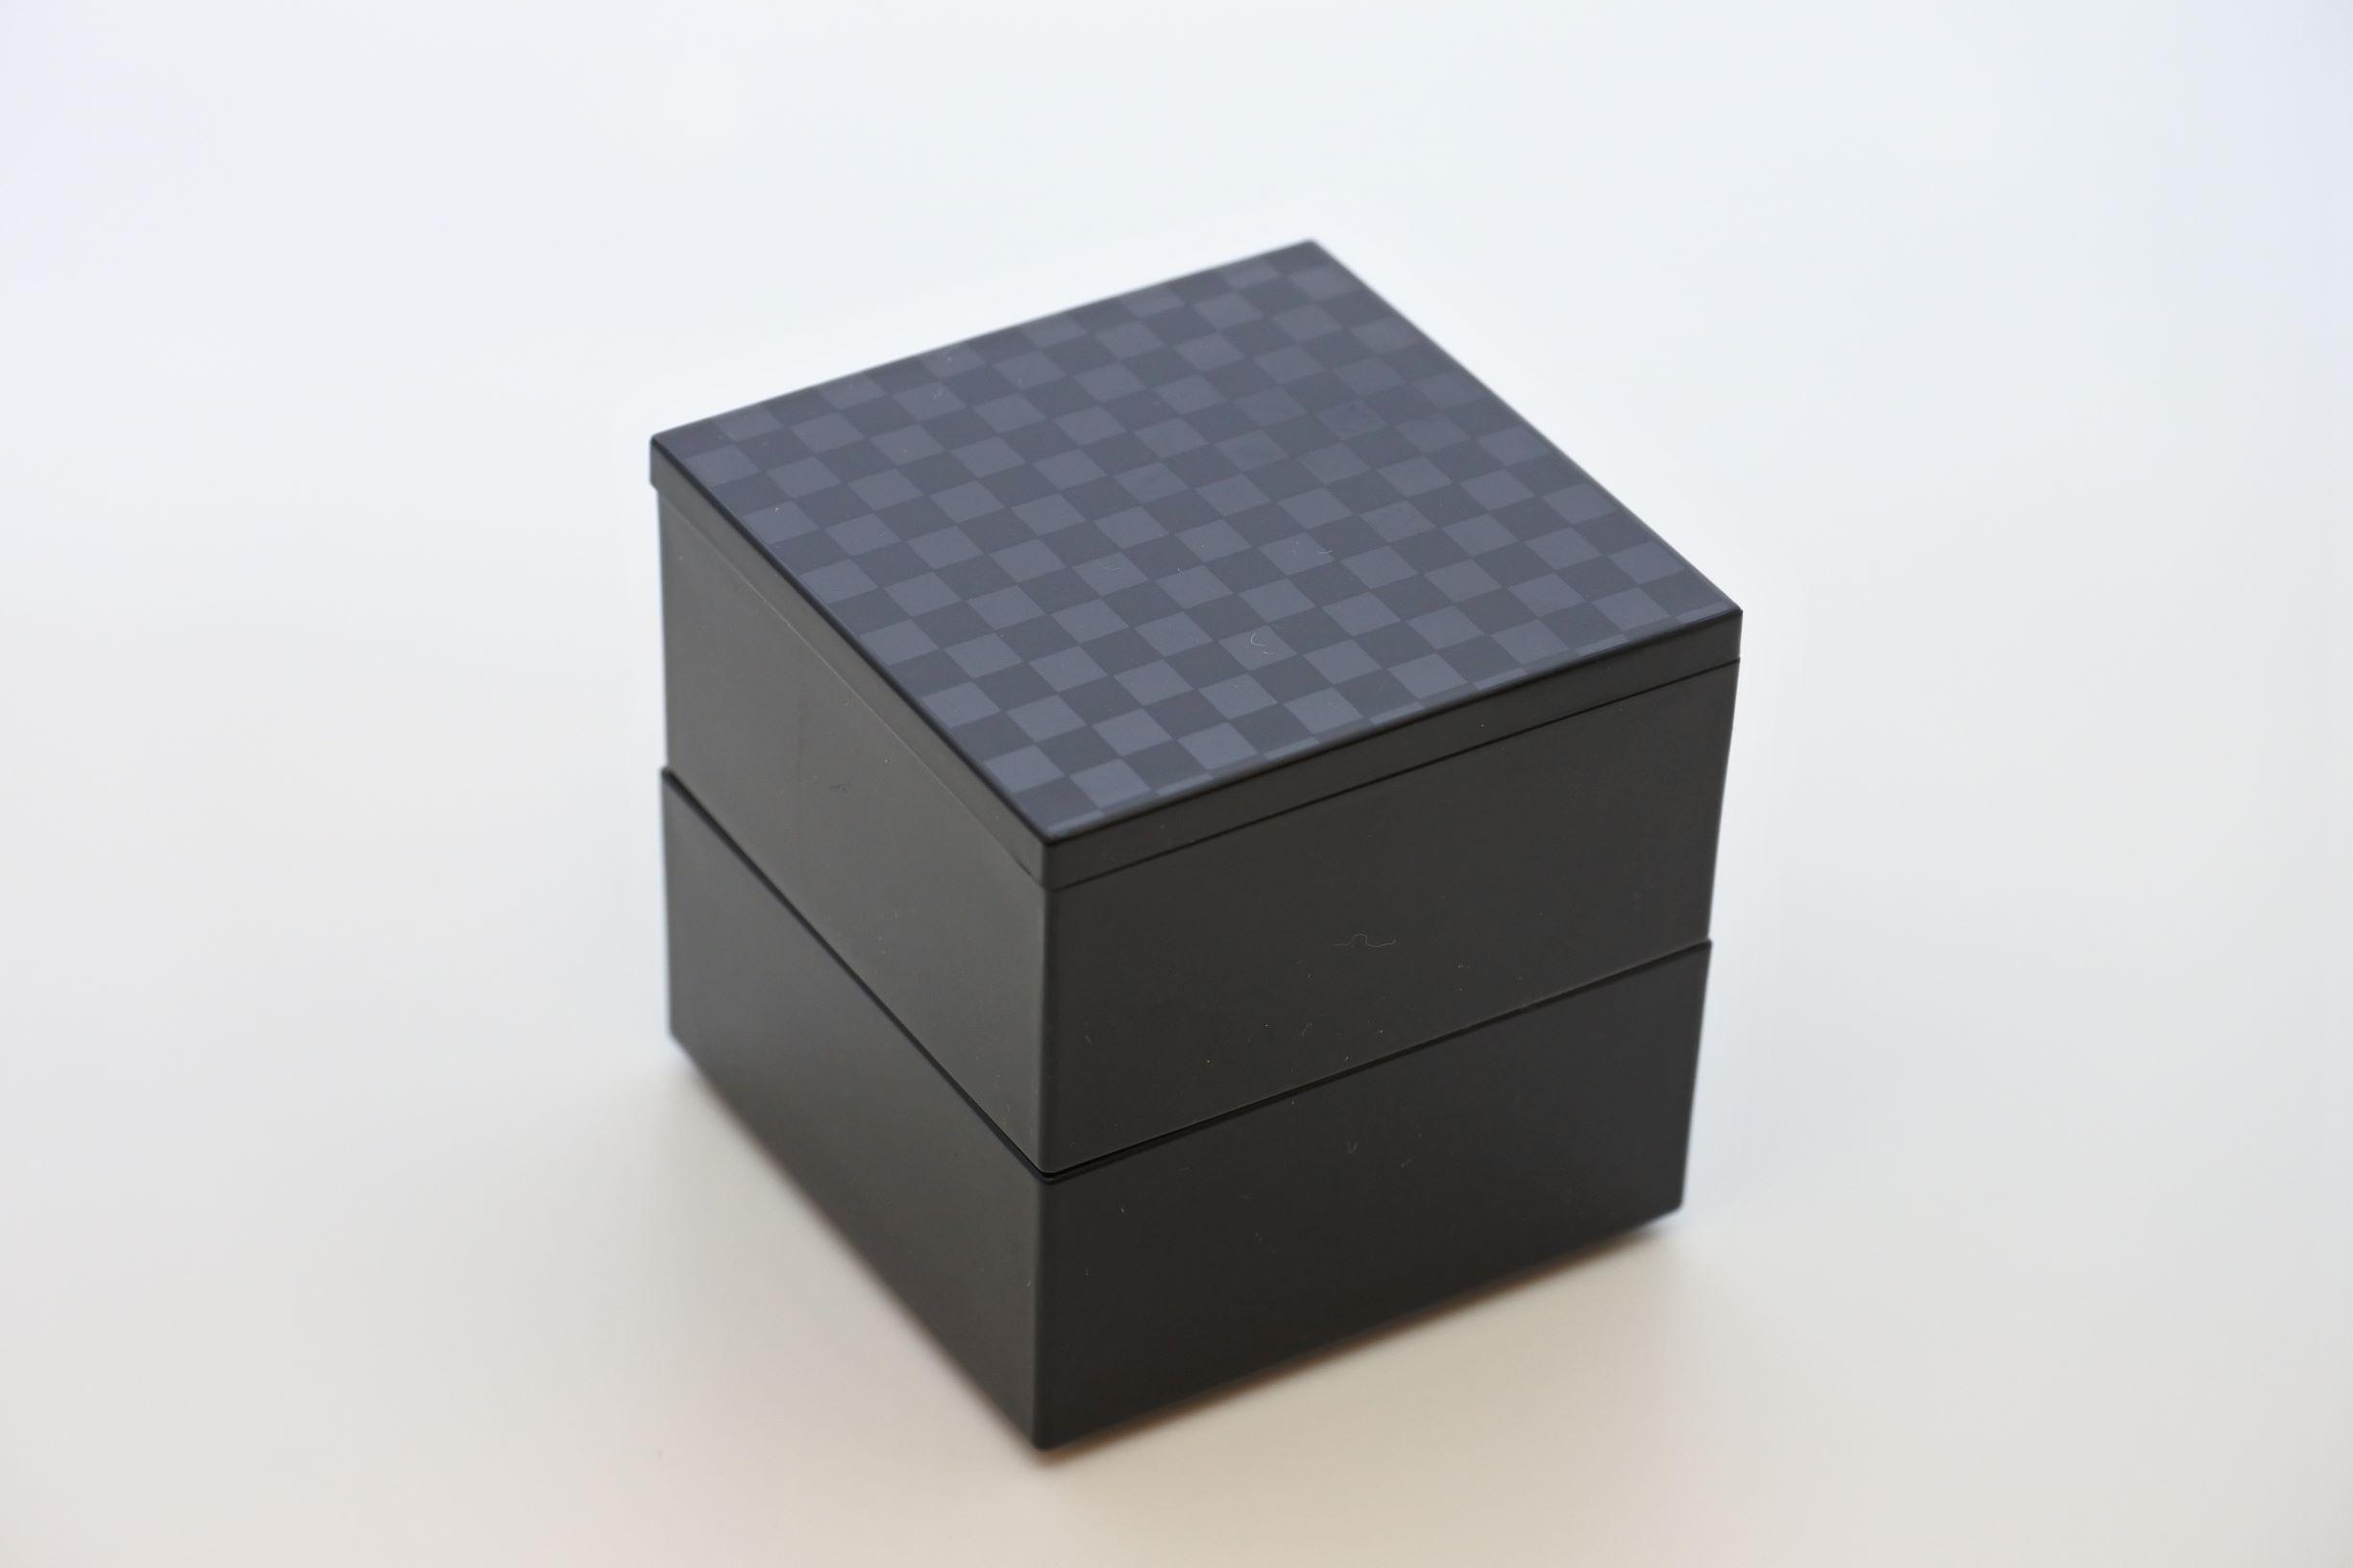 《新商品》JUBAKO/重箱/チェス2.3二段中子重(黒)(A)KZ2976A≪Kaze-ya style≫